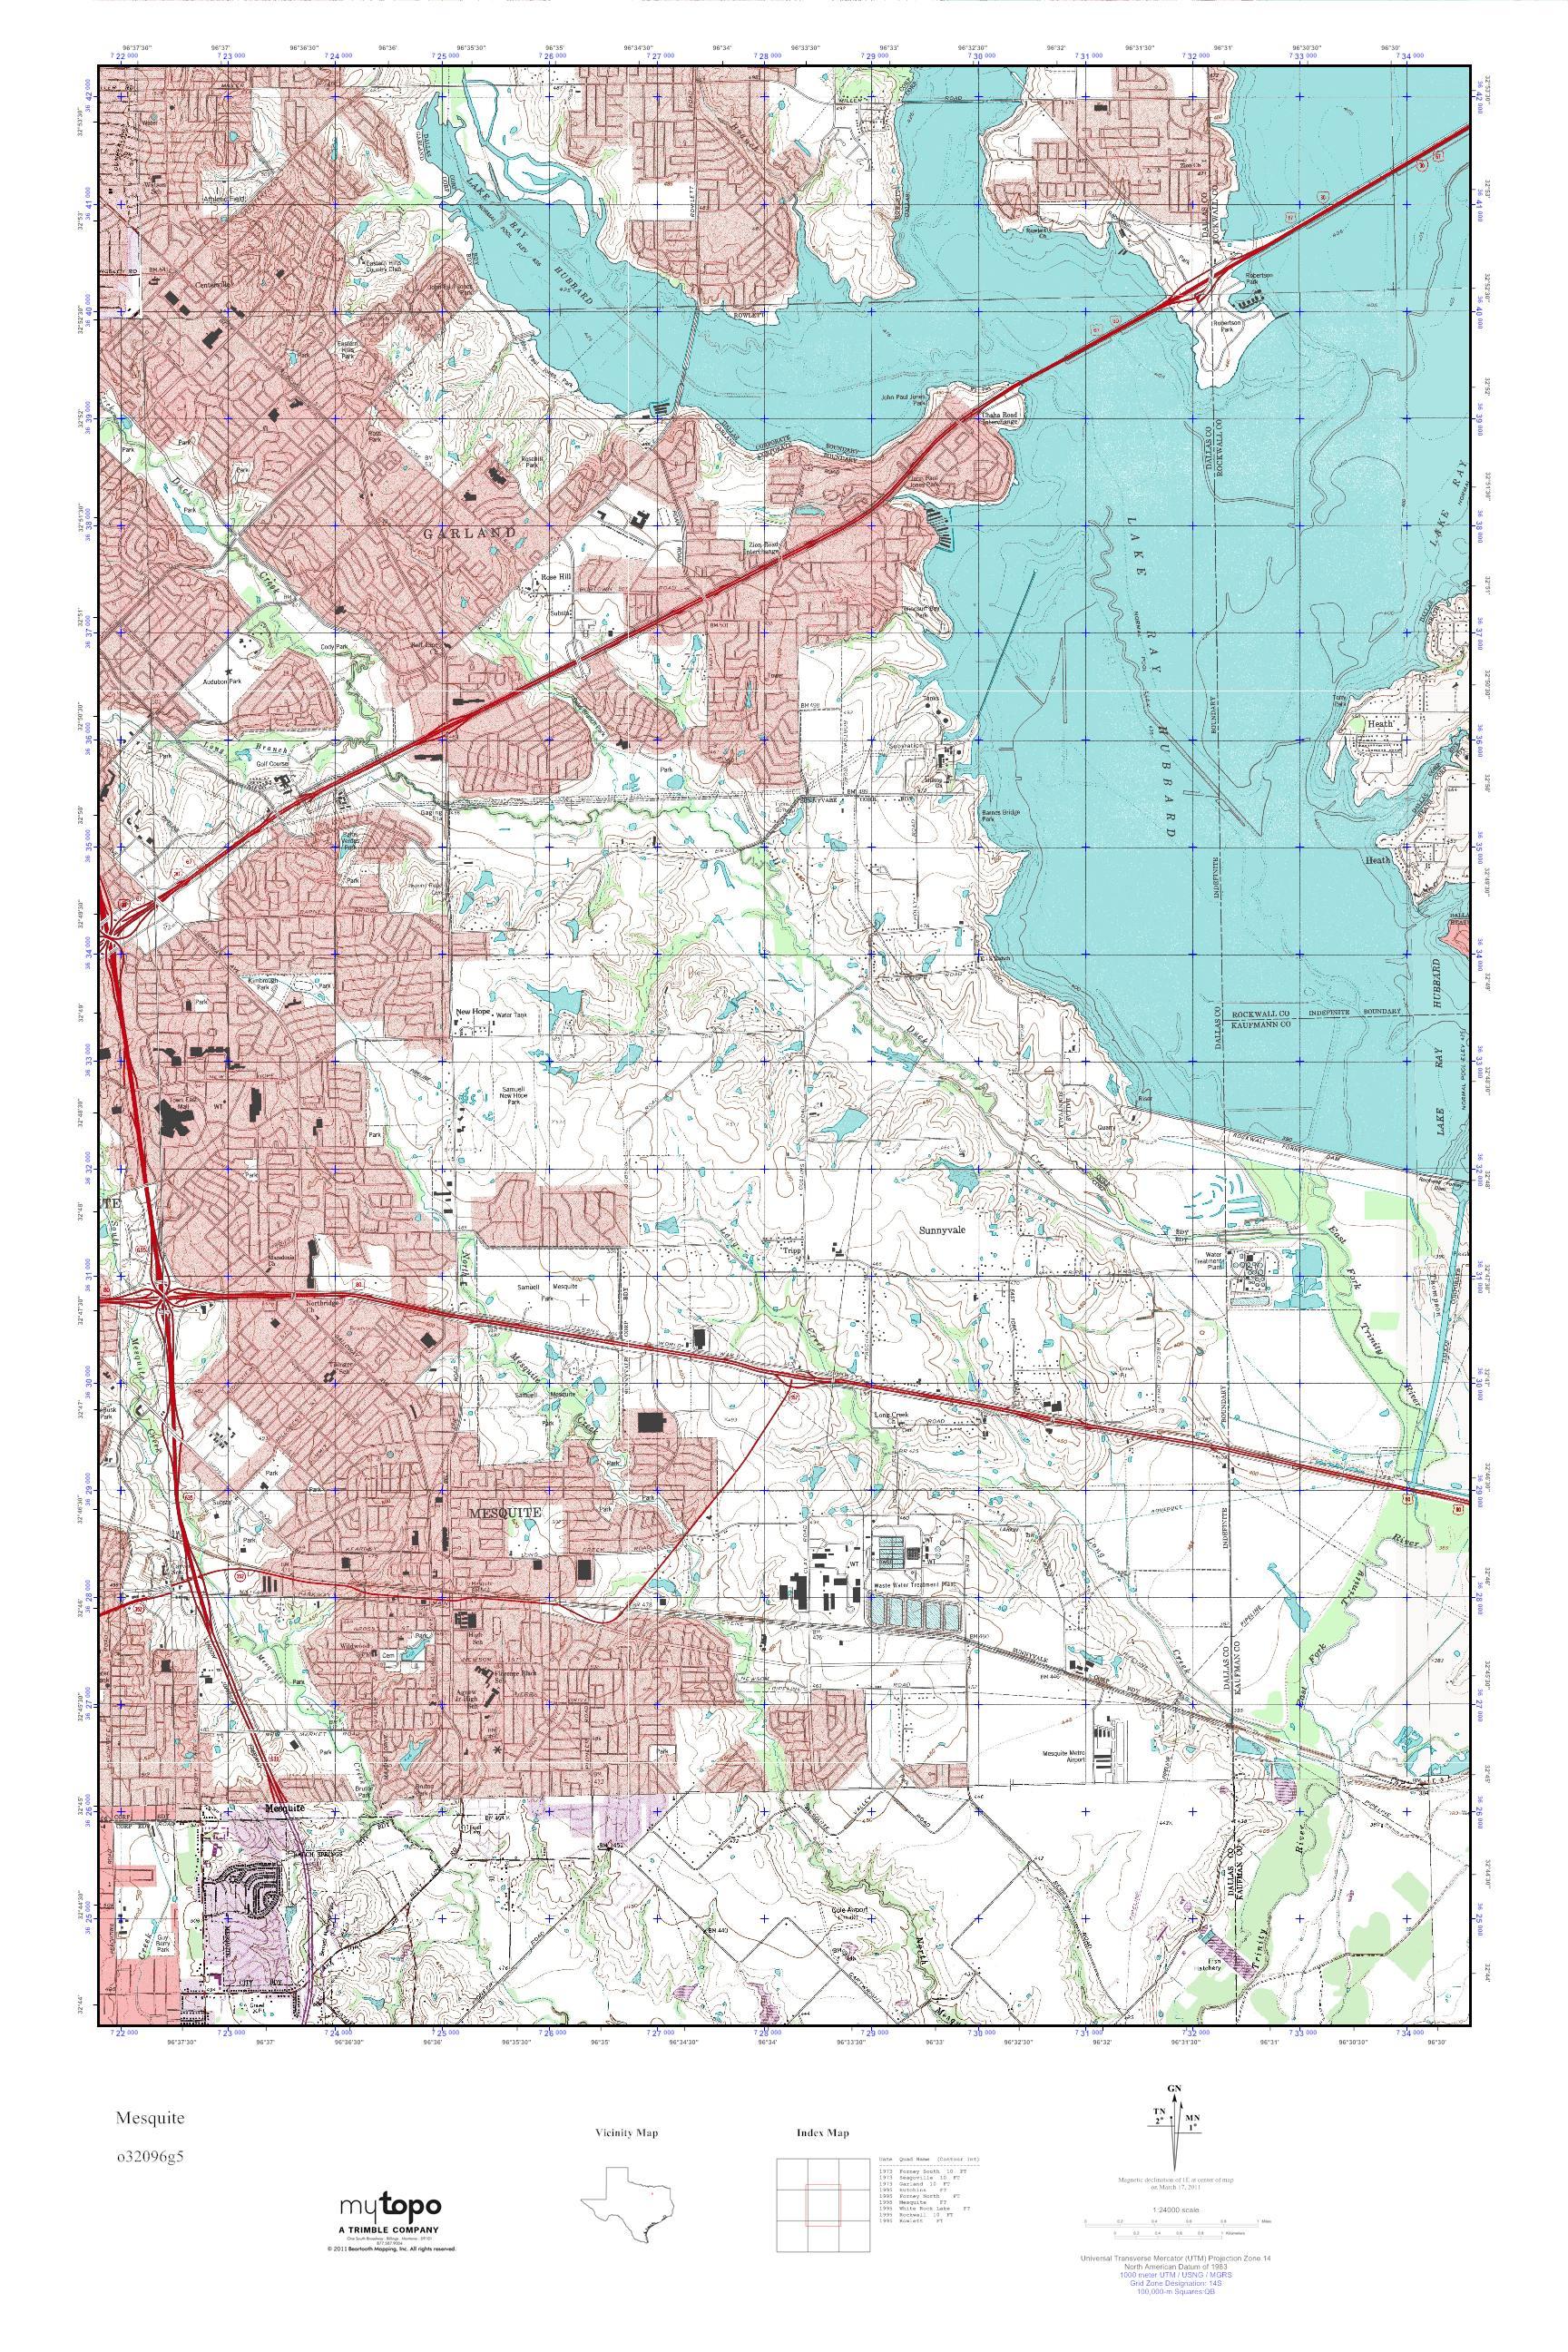 Mytopo Mesquite, Texas Usgs Quad Topo Map - Mesquite Texas Map